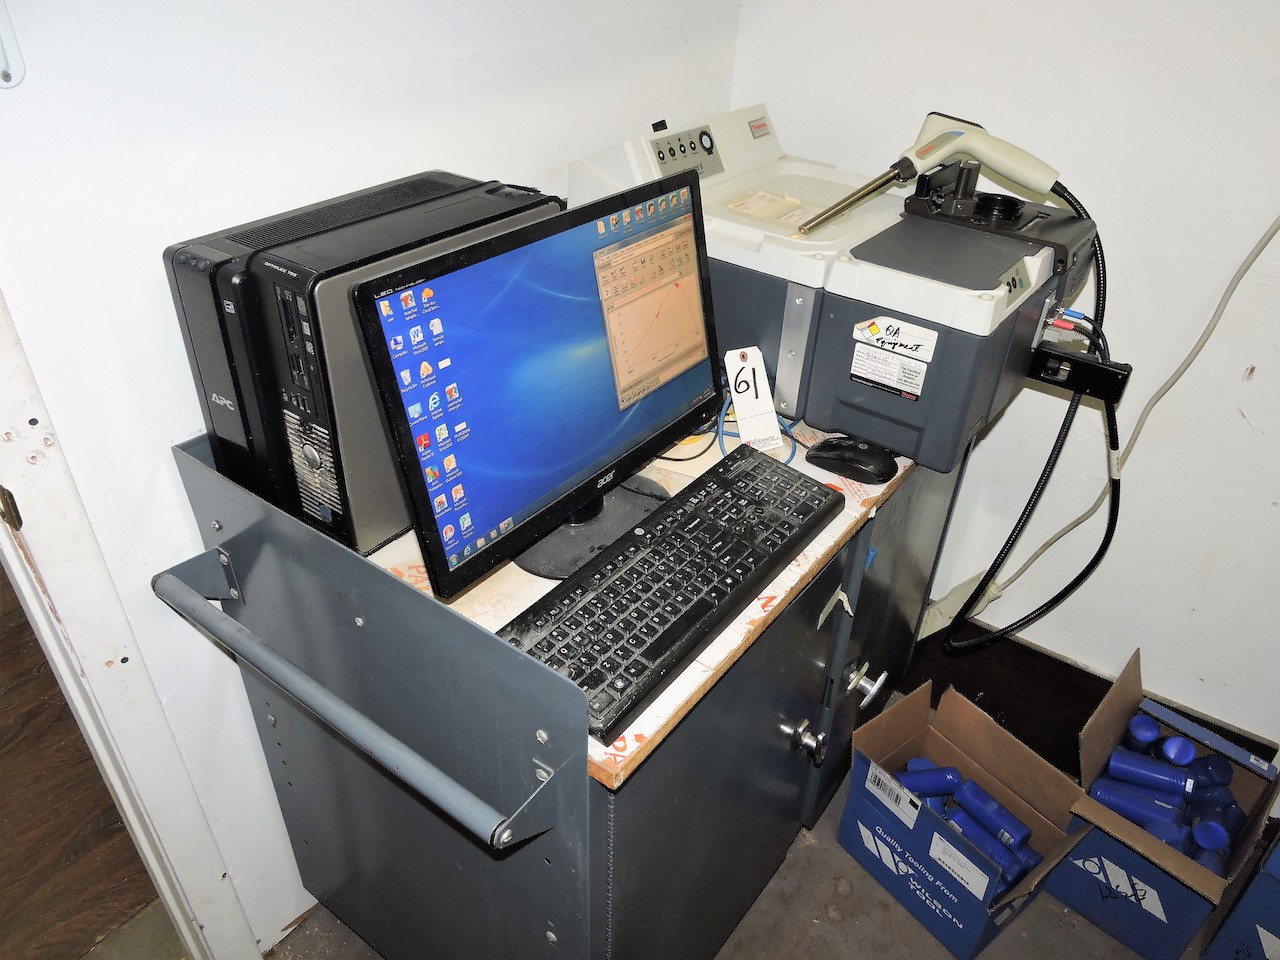 Lot 61 - THERMO SCIENTIFIC ANTARIS II FT-NIR ANALYSER: WITH SABIR FIBER OPTIC PROBE